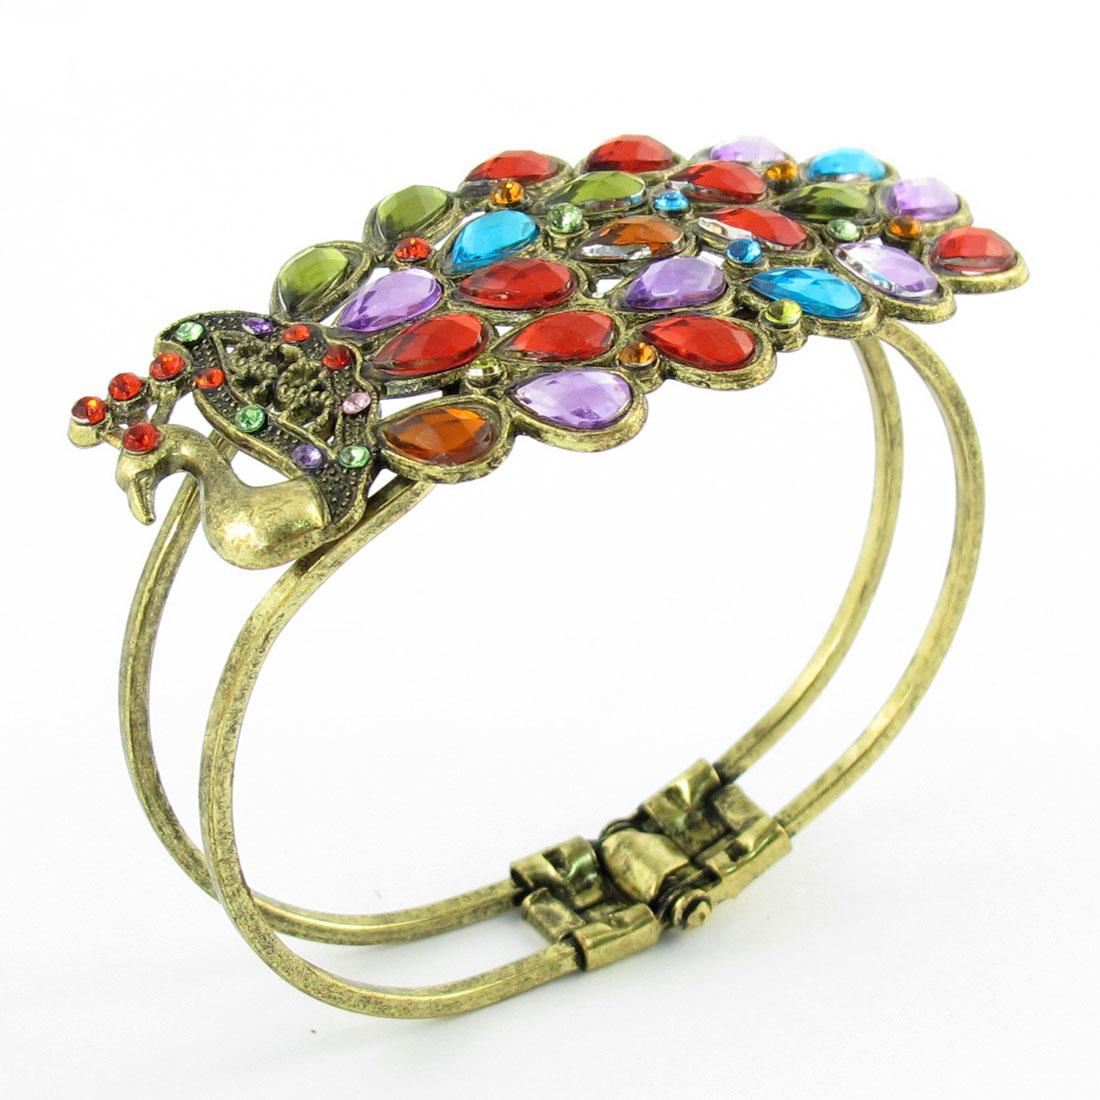 Red Green Rhinestone Inlaid Peacock Design Bronze Tone Bracelet for Ladies